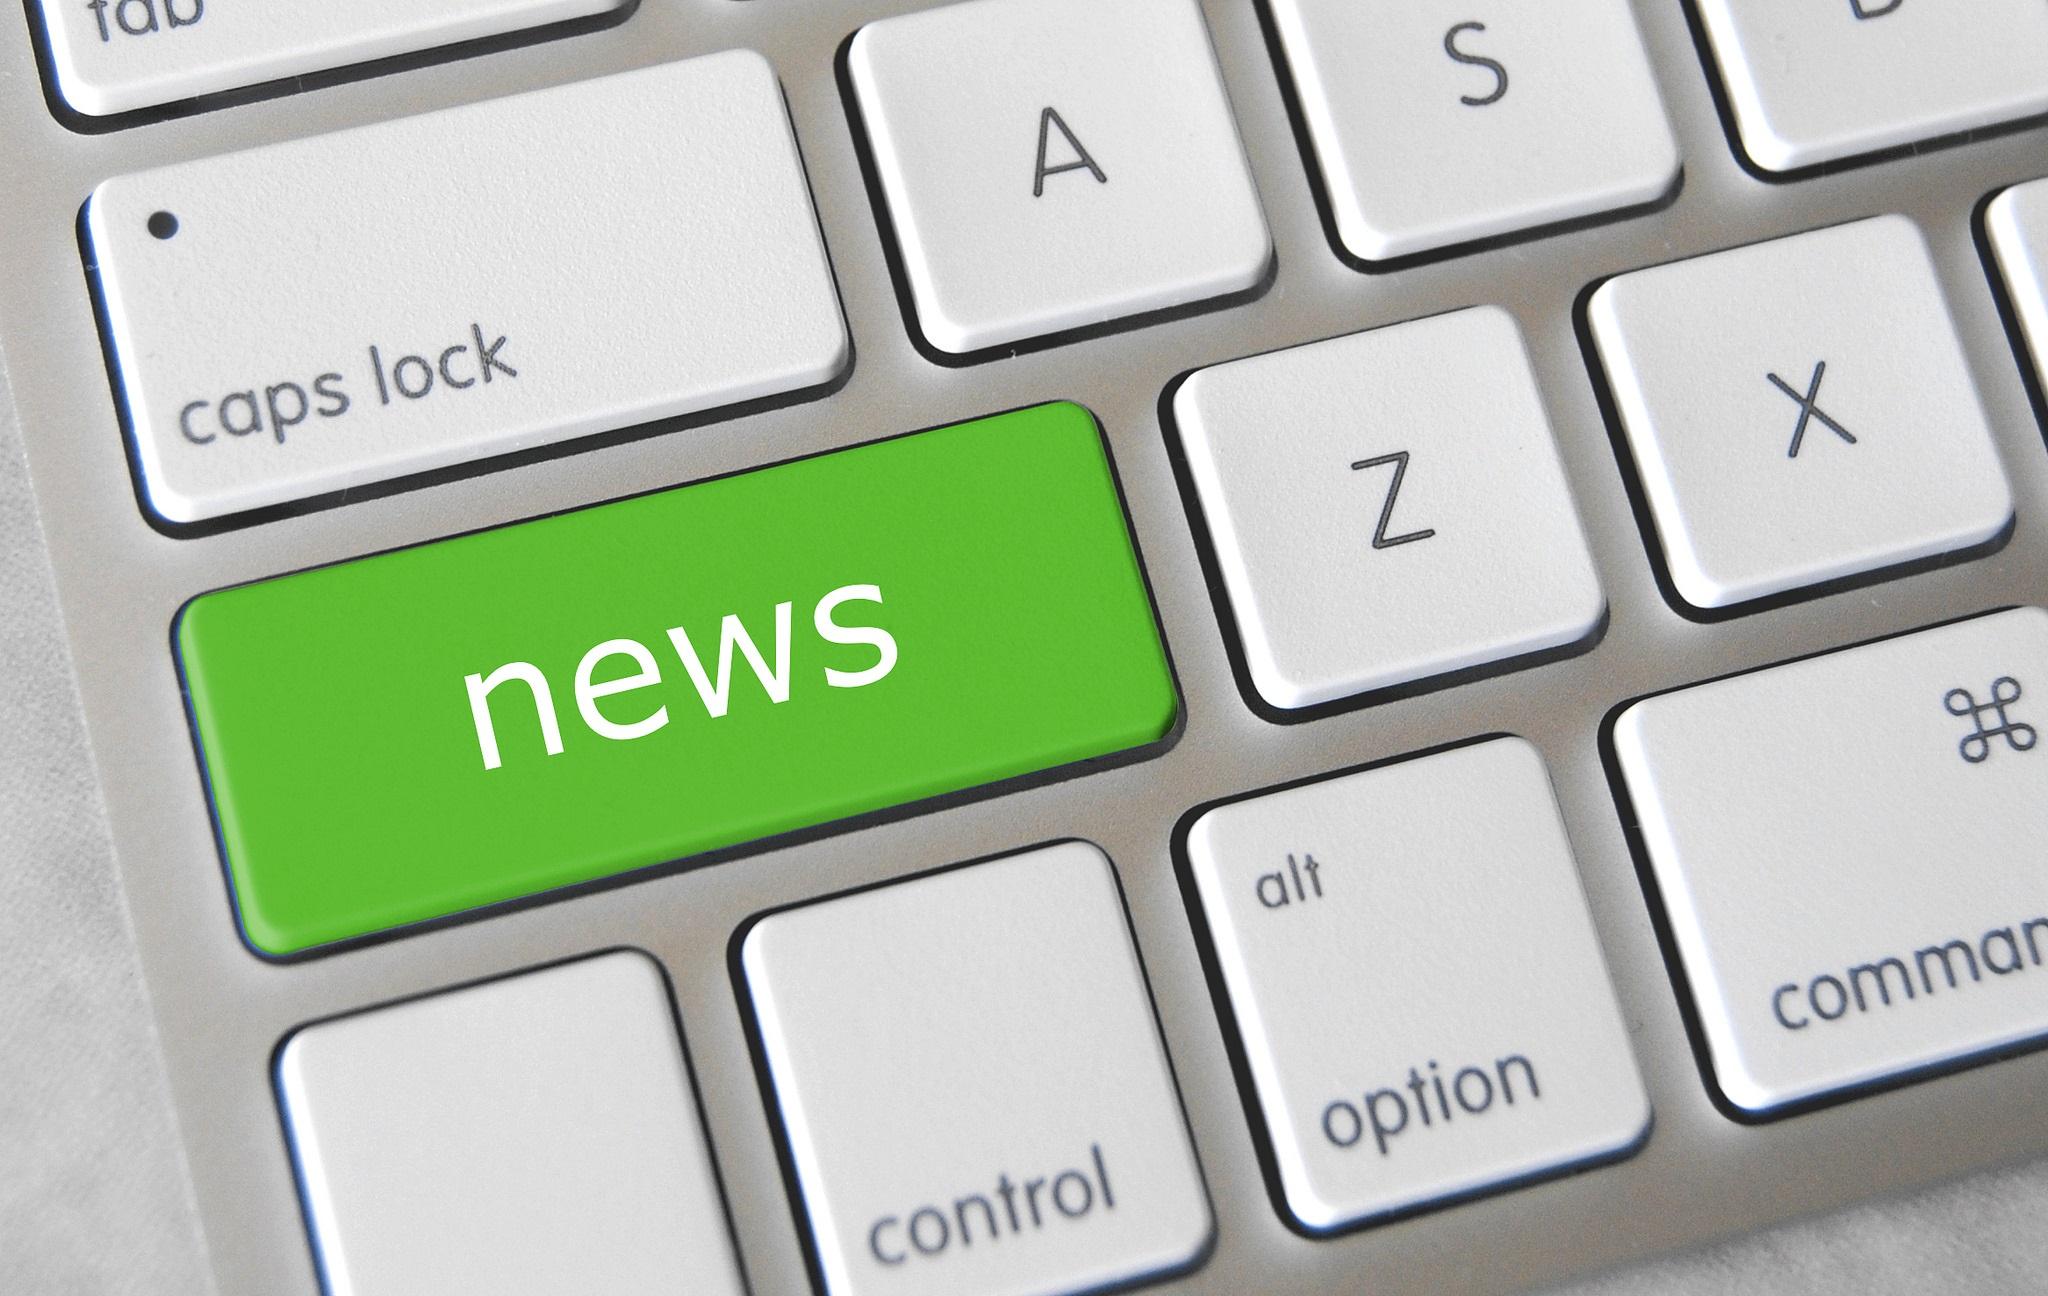 Christian news makes headlines